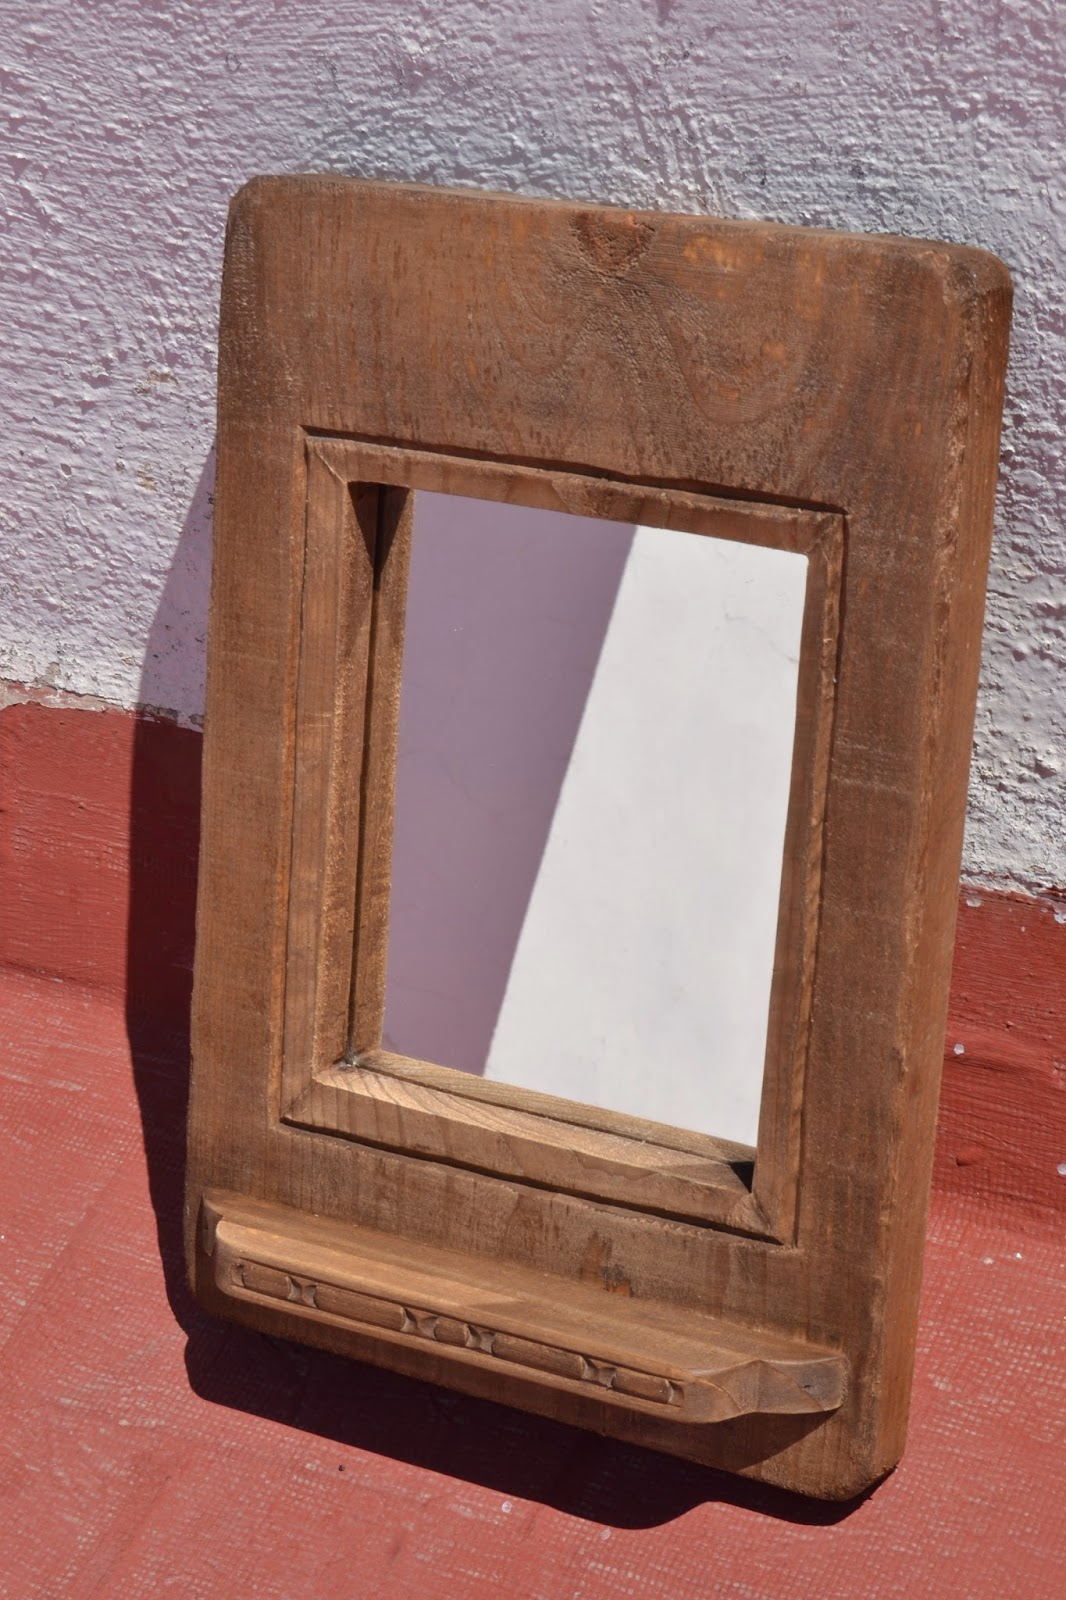 artesan a r stica en madera marco de madera rustico